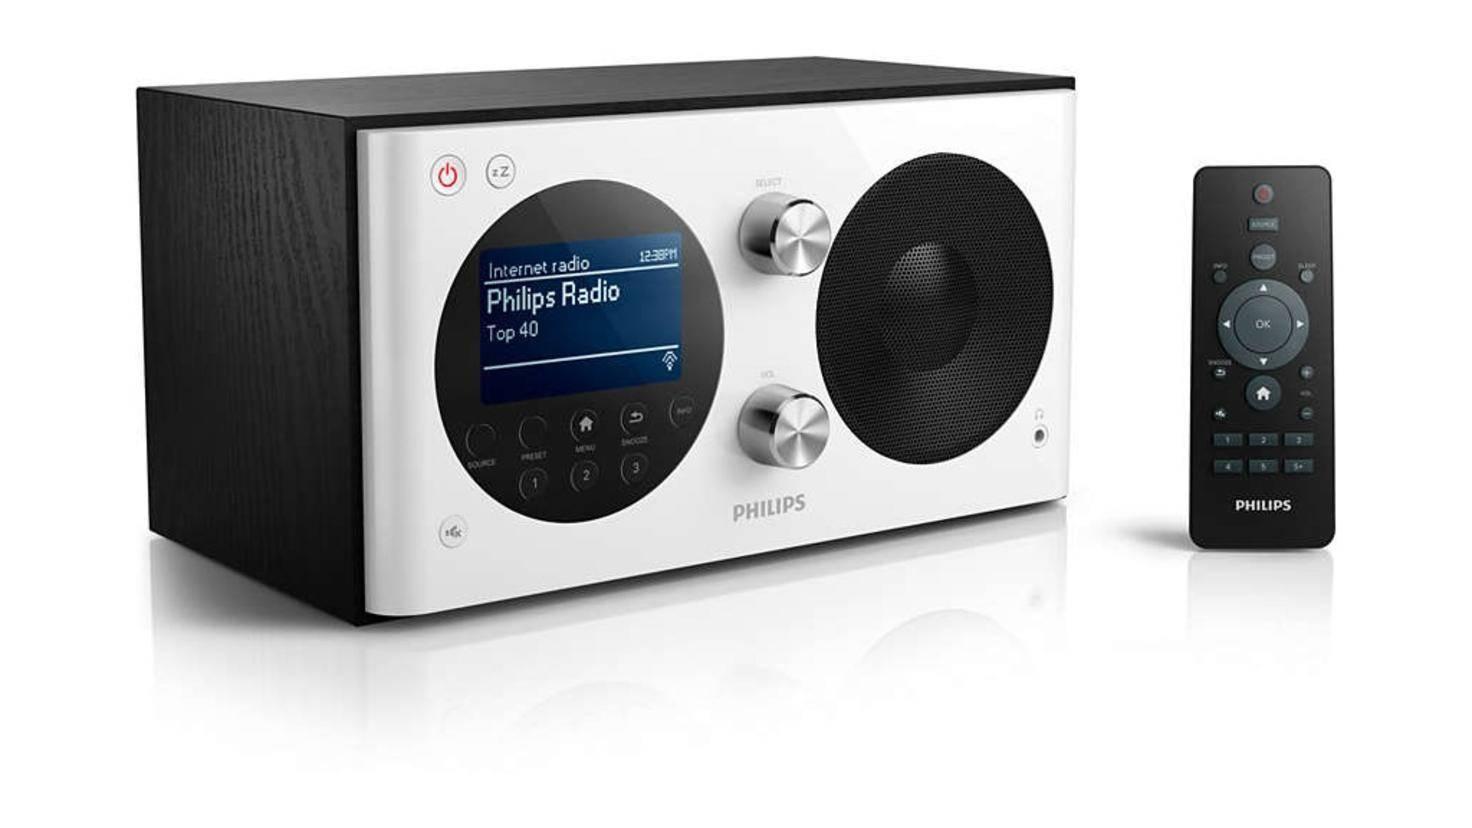 Philips-Internetradio-DAB-Plus